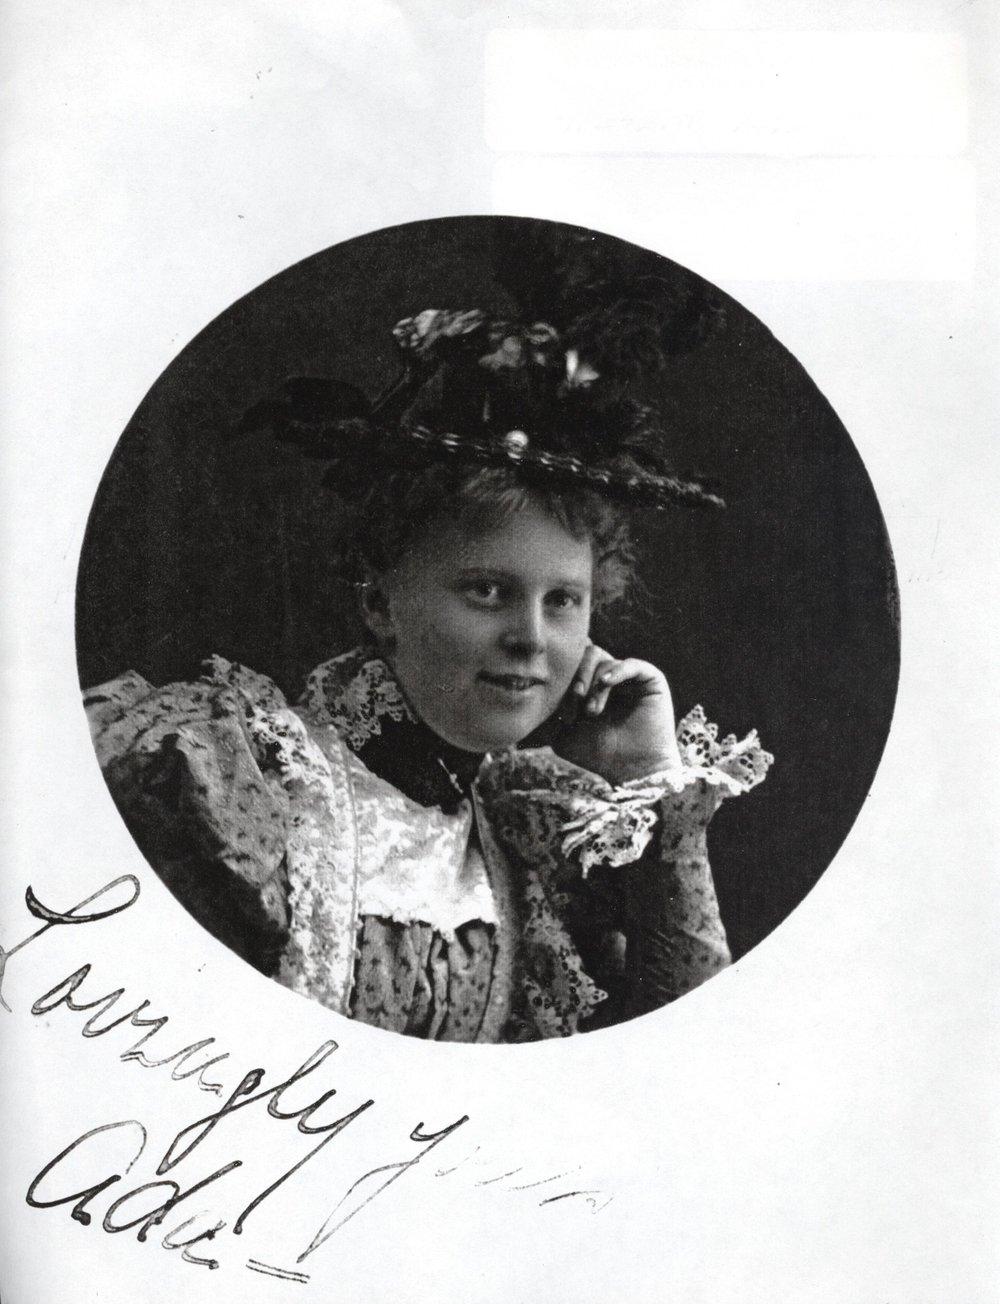 Adelaide Pearce